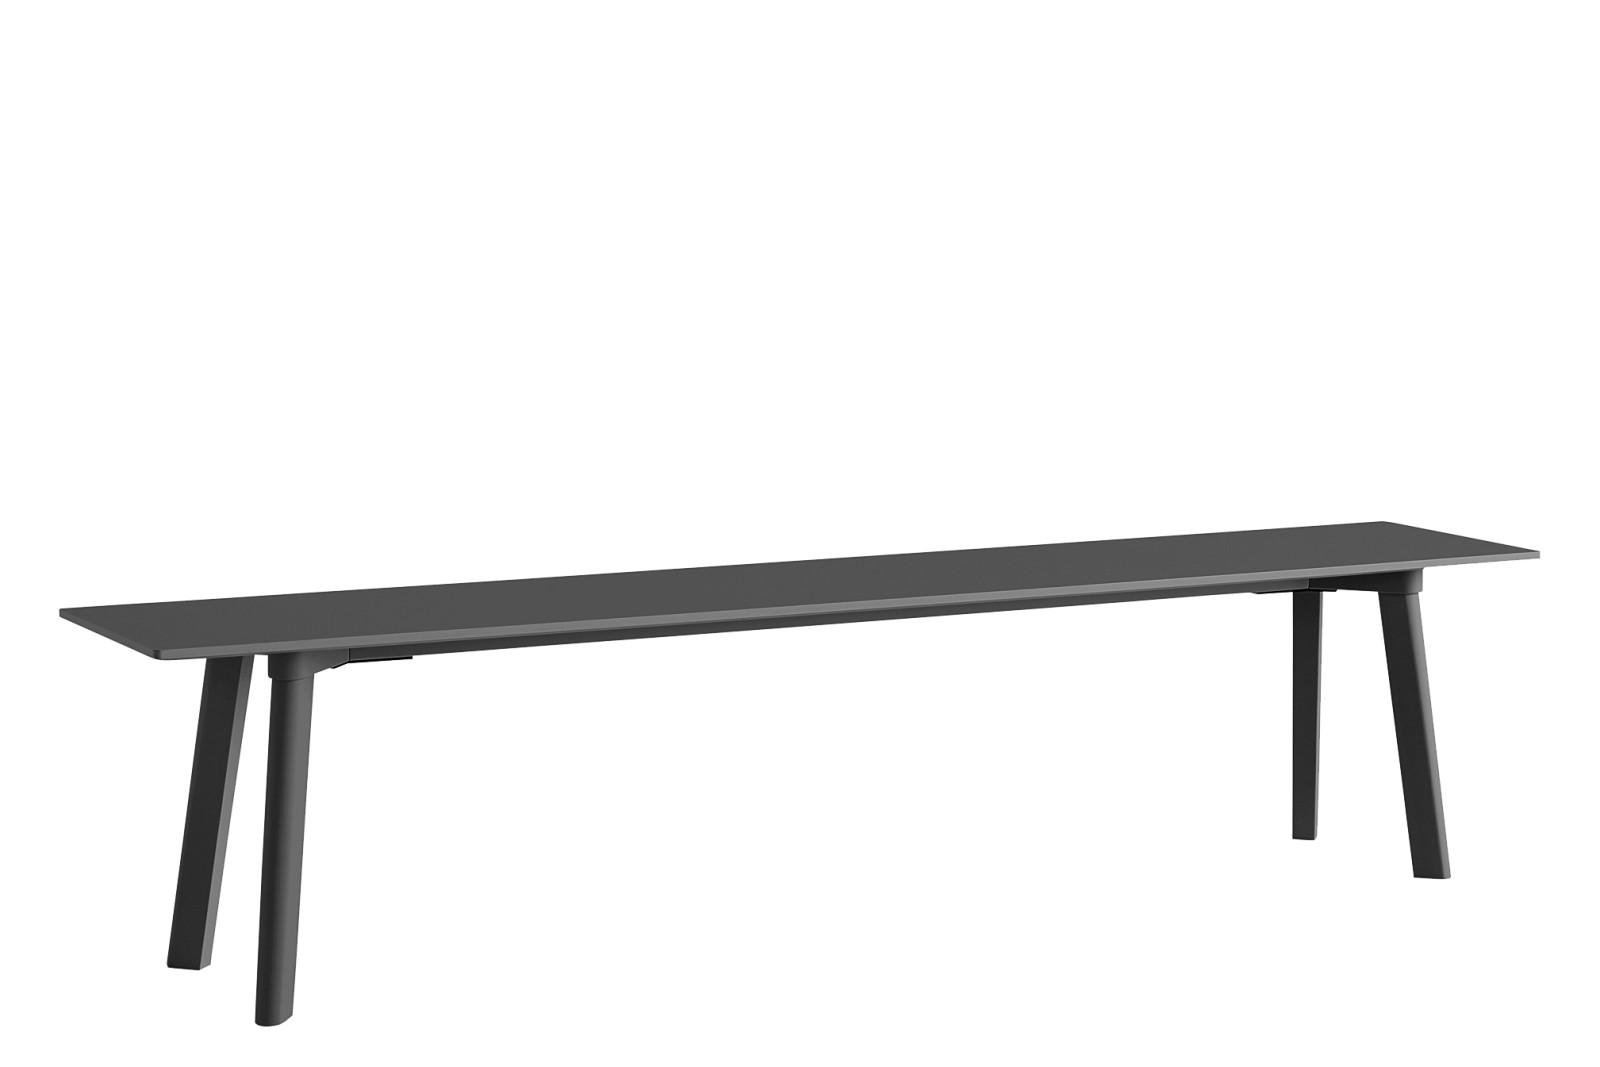 CPH Deux 215 Bench Laminate Stone Grey / Wood Stone Grey Beech, 200 x 35cm